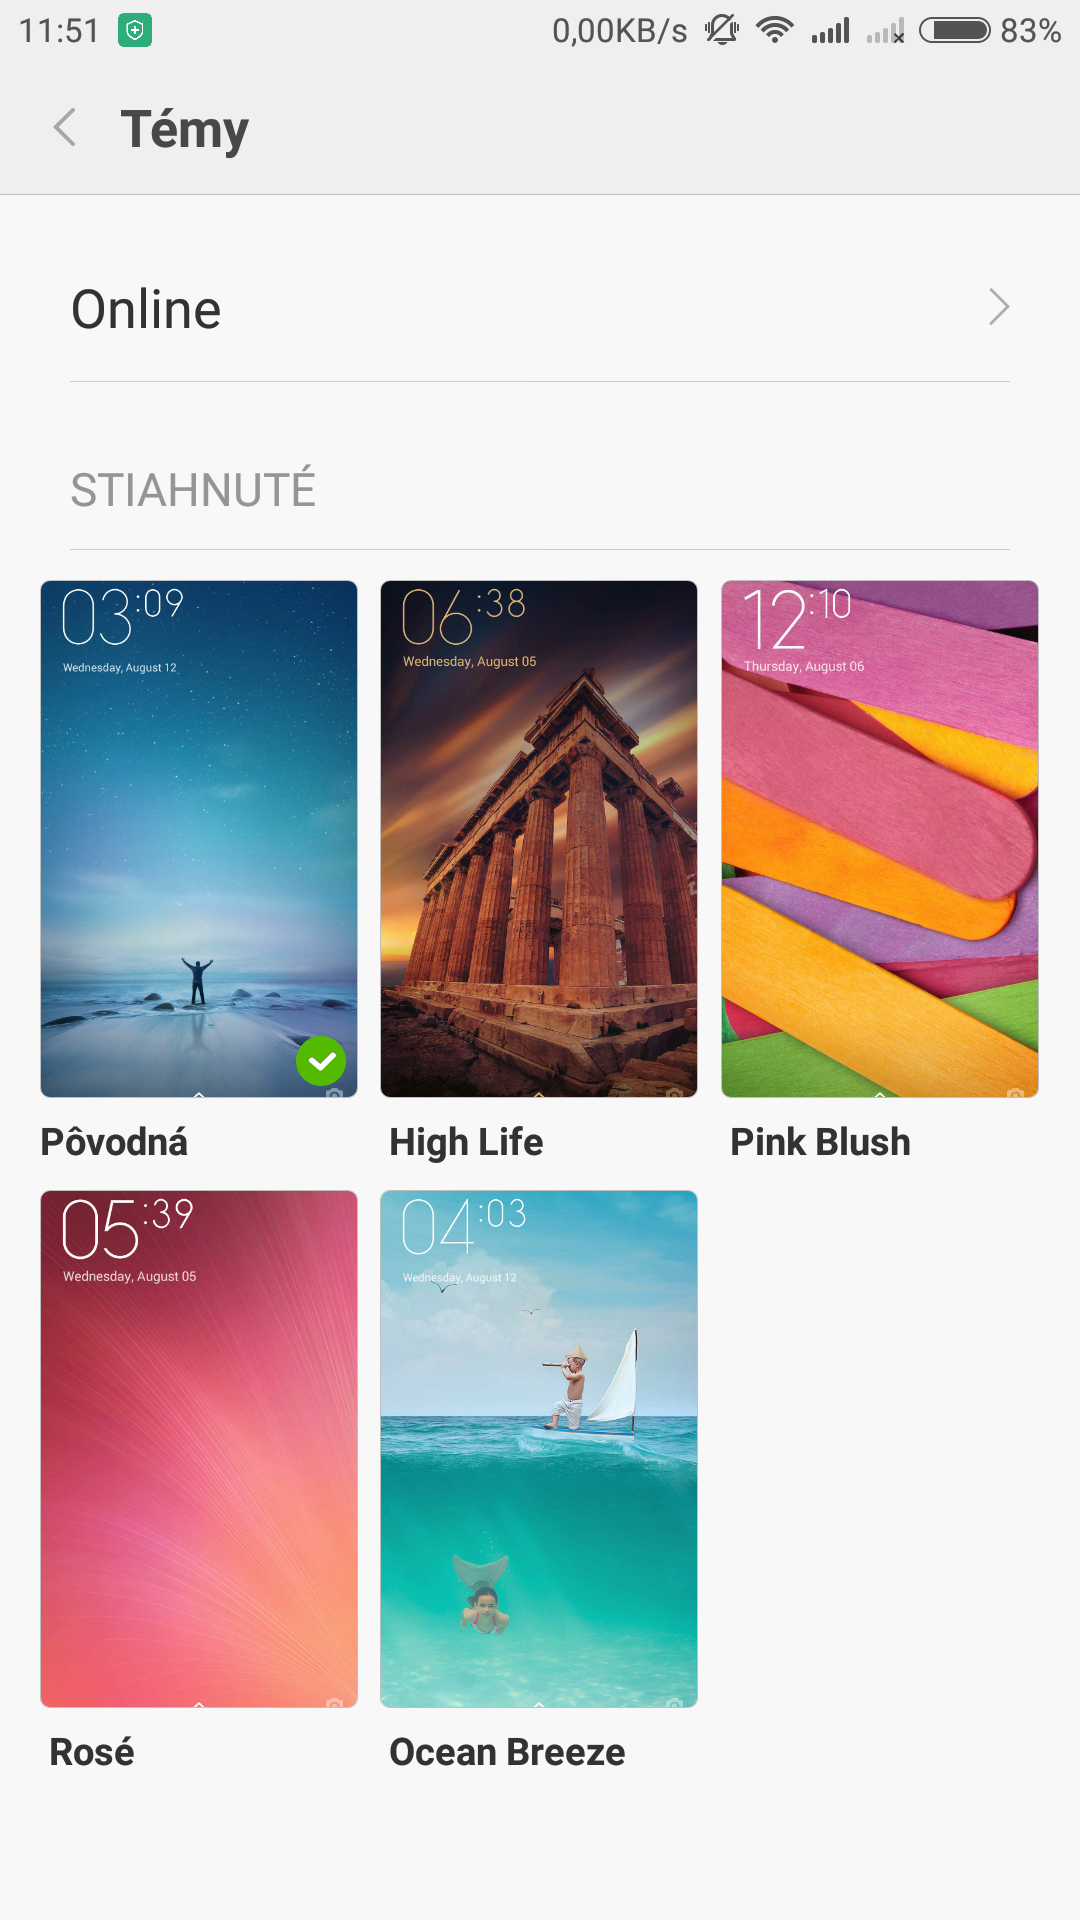 Screenshot_com.android.thememanager_2015-09-27-11-51-27